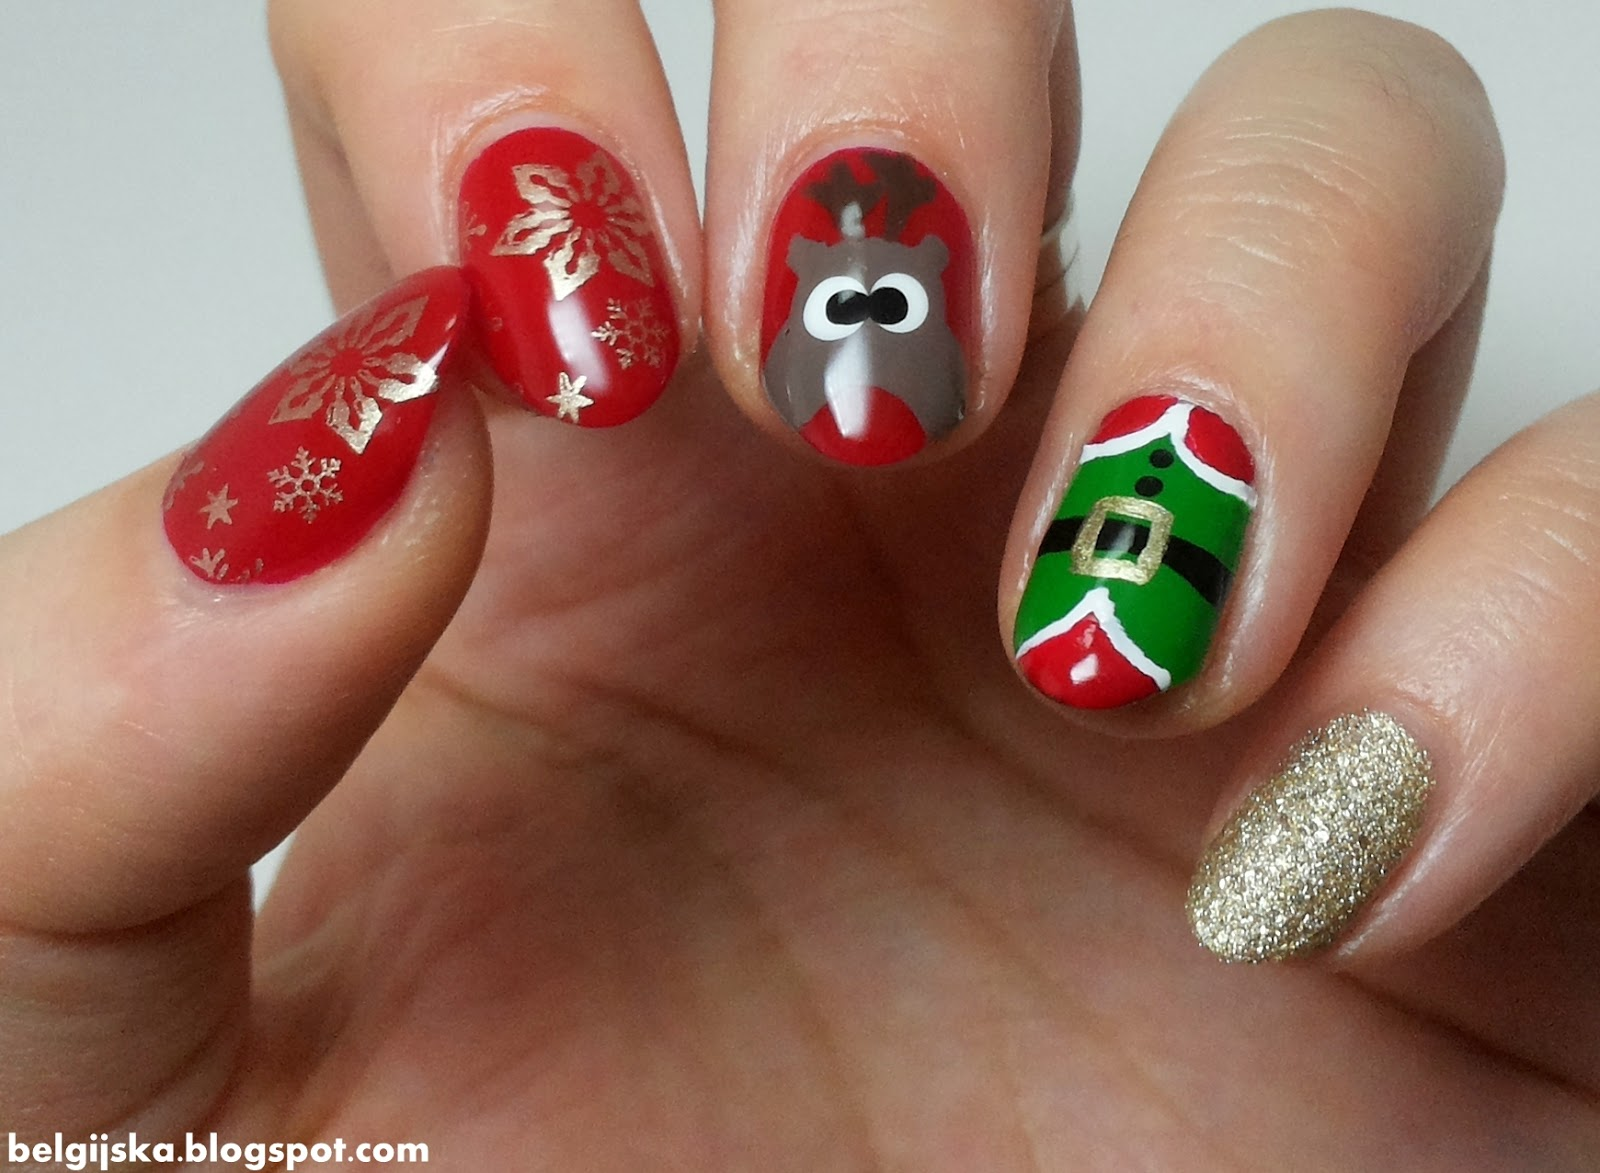 http://belgijska.blogspot.com/2015/12/zima-z-owidia-tydzien-1-mikoajki-holo.html